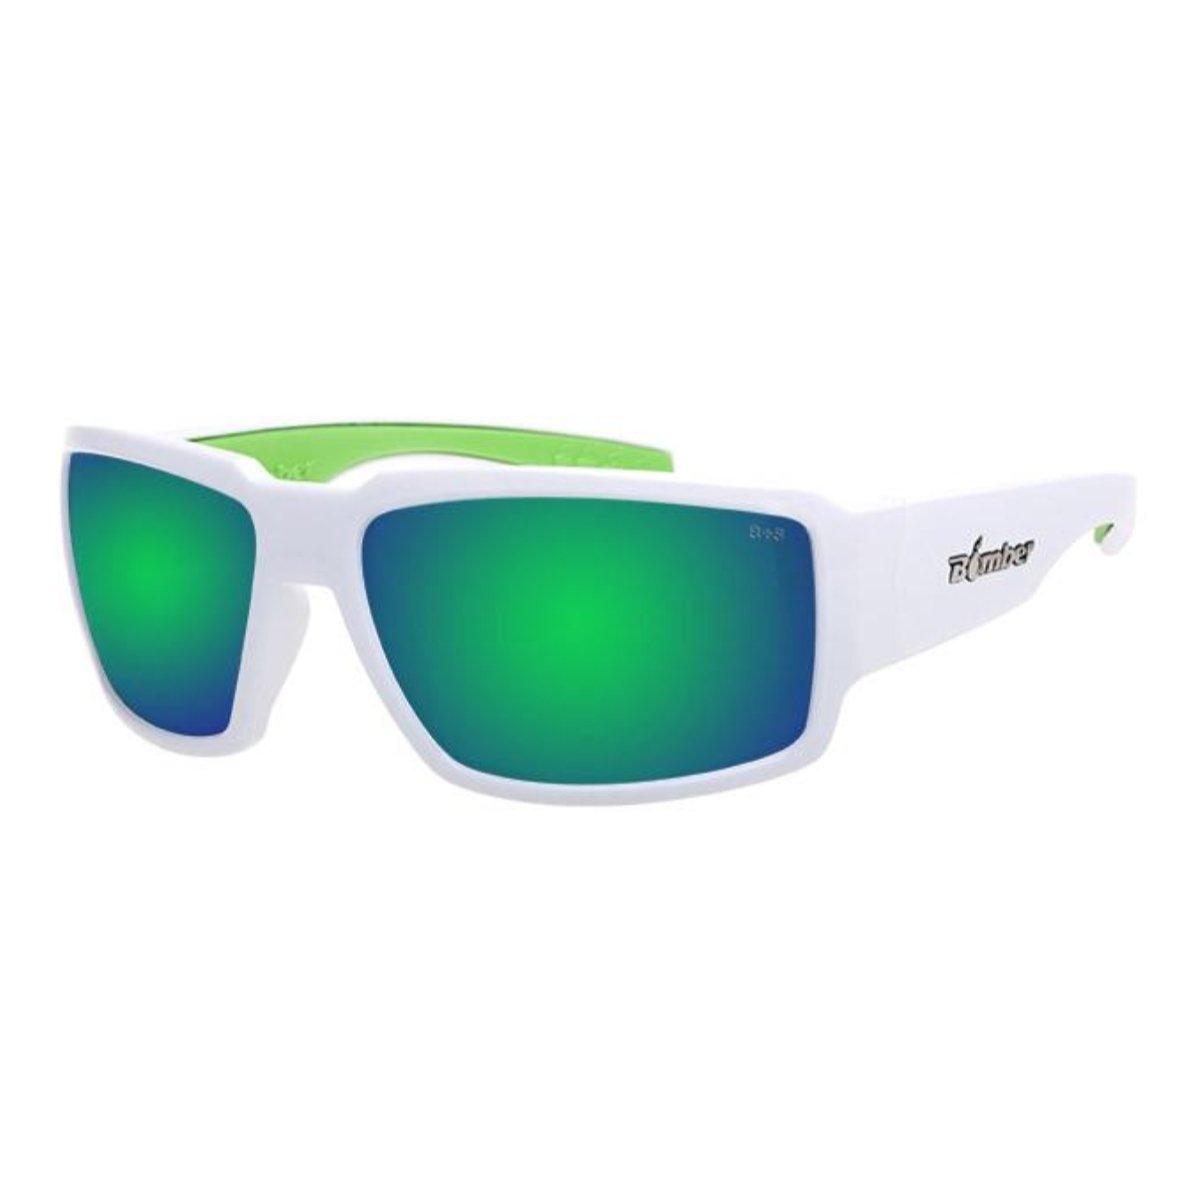 Bomber Sunglasses - Boogie Bomb Glossy White Frm/Green Mirror Pc Lens/Green Foam